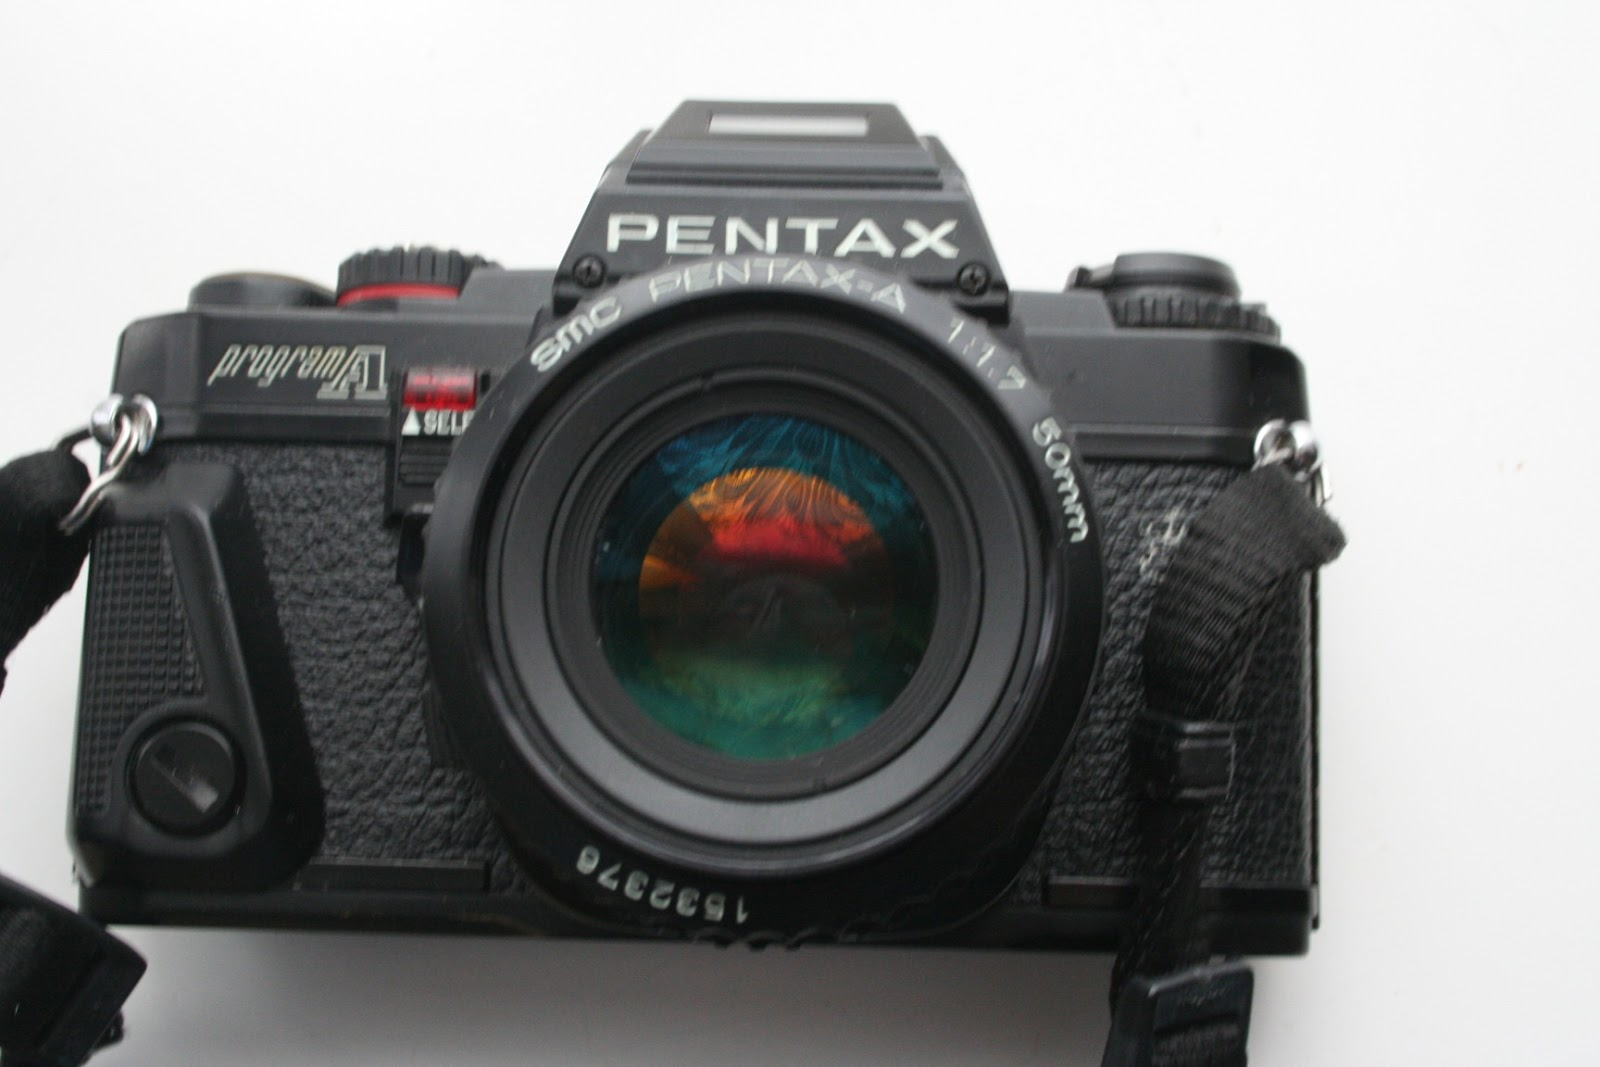 Pentax SUPER A 35mm SLR Film Camera with 50mm f1.7 pka lens